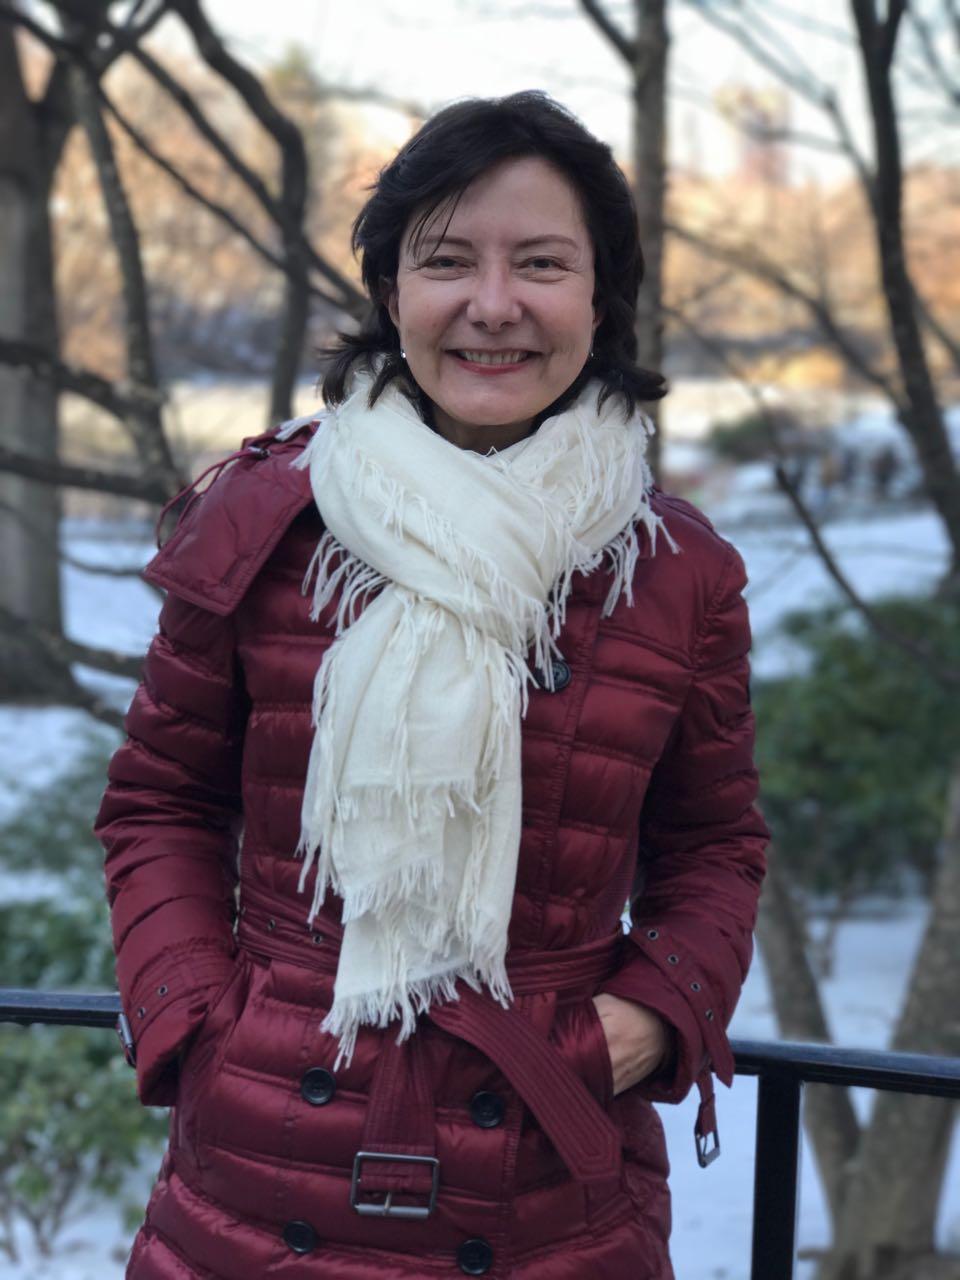 Cristina in NYC